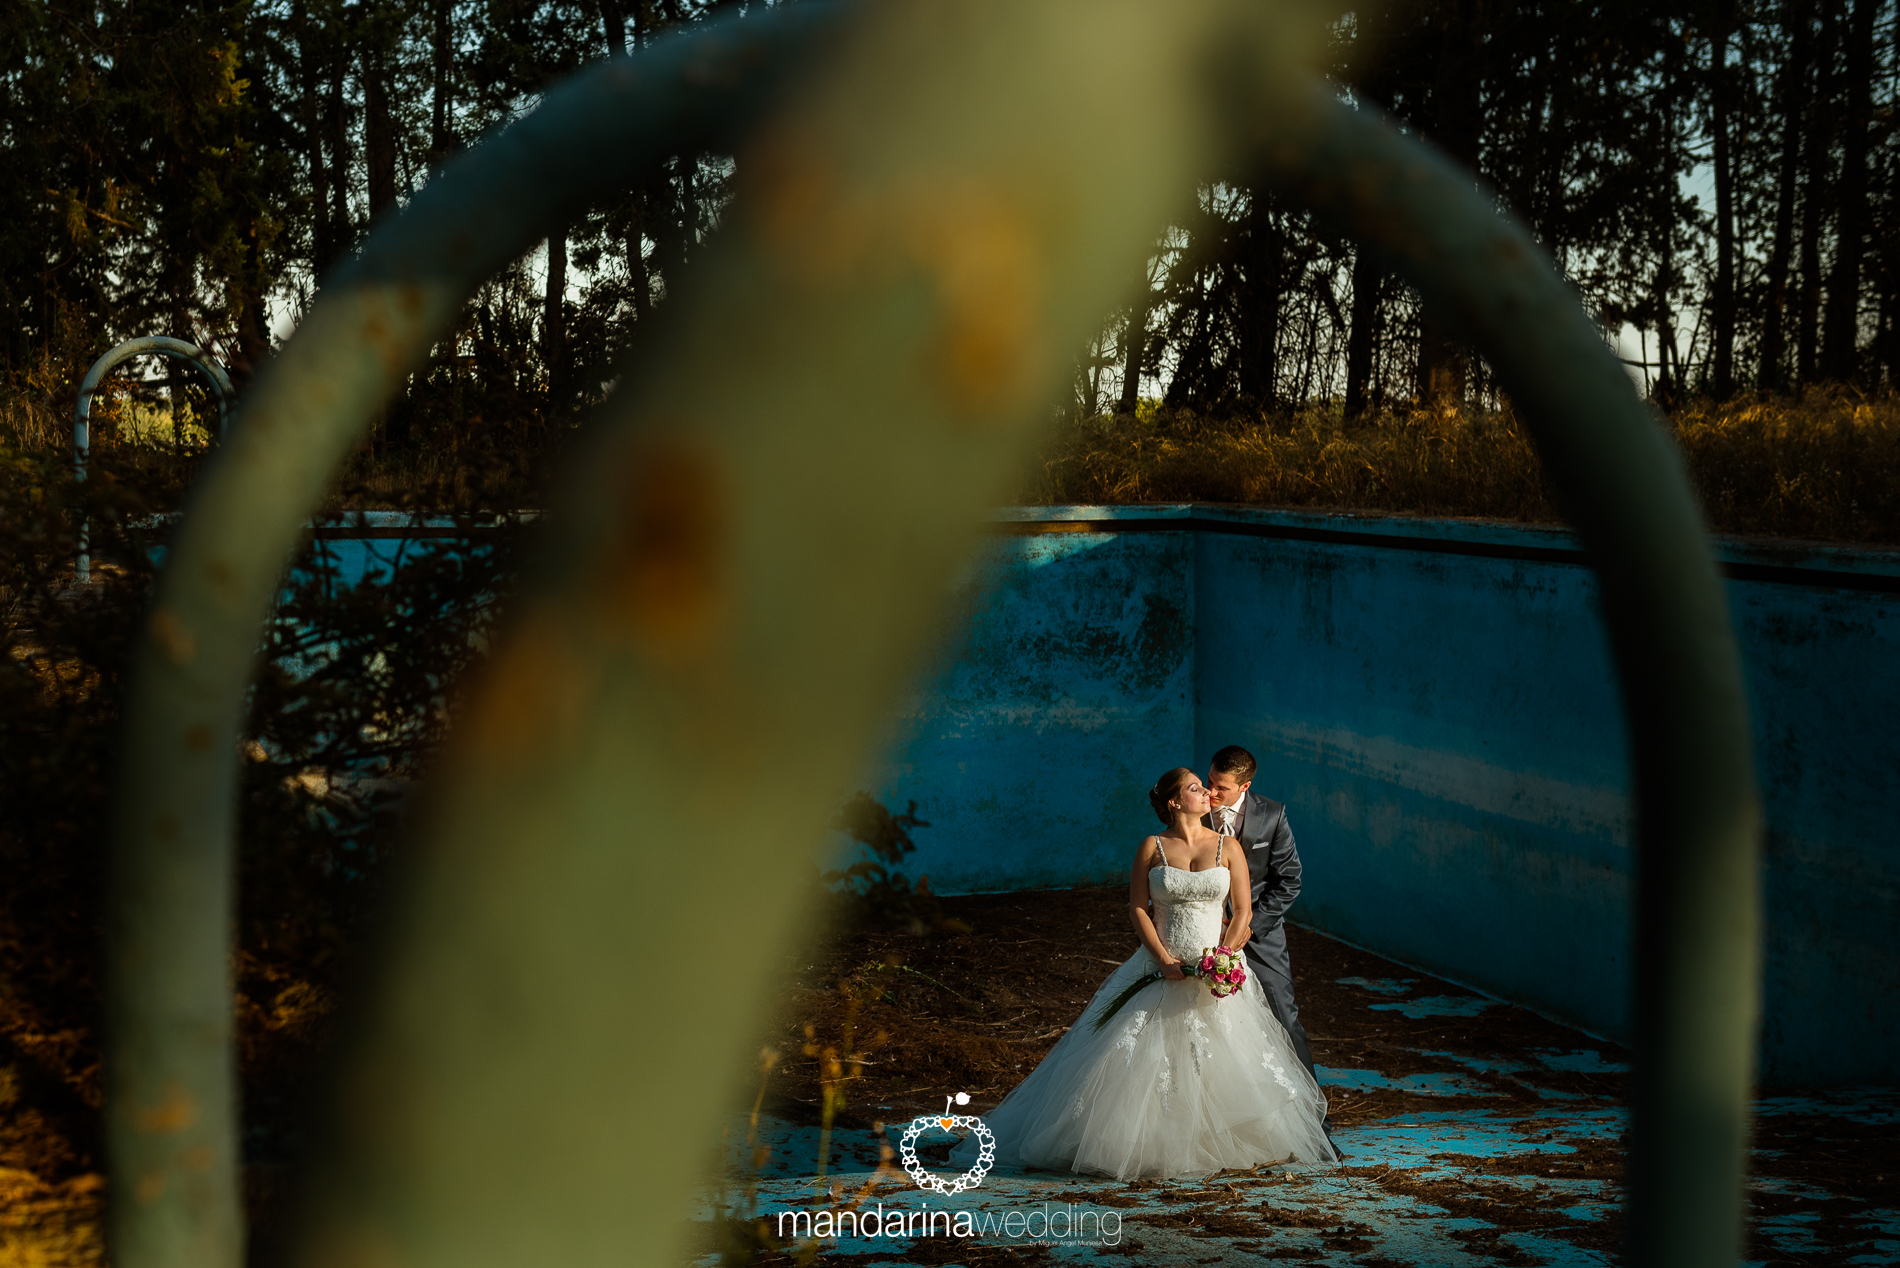 mandarina wedding, mejores fotografos boda, fotografo zaragoza, fotografo huesca, fotografo soria, fotografo lerida_38